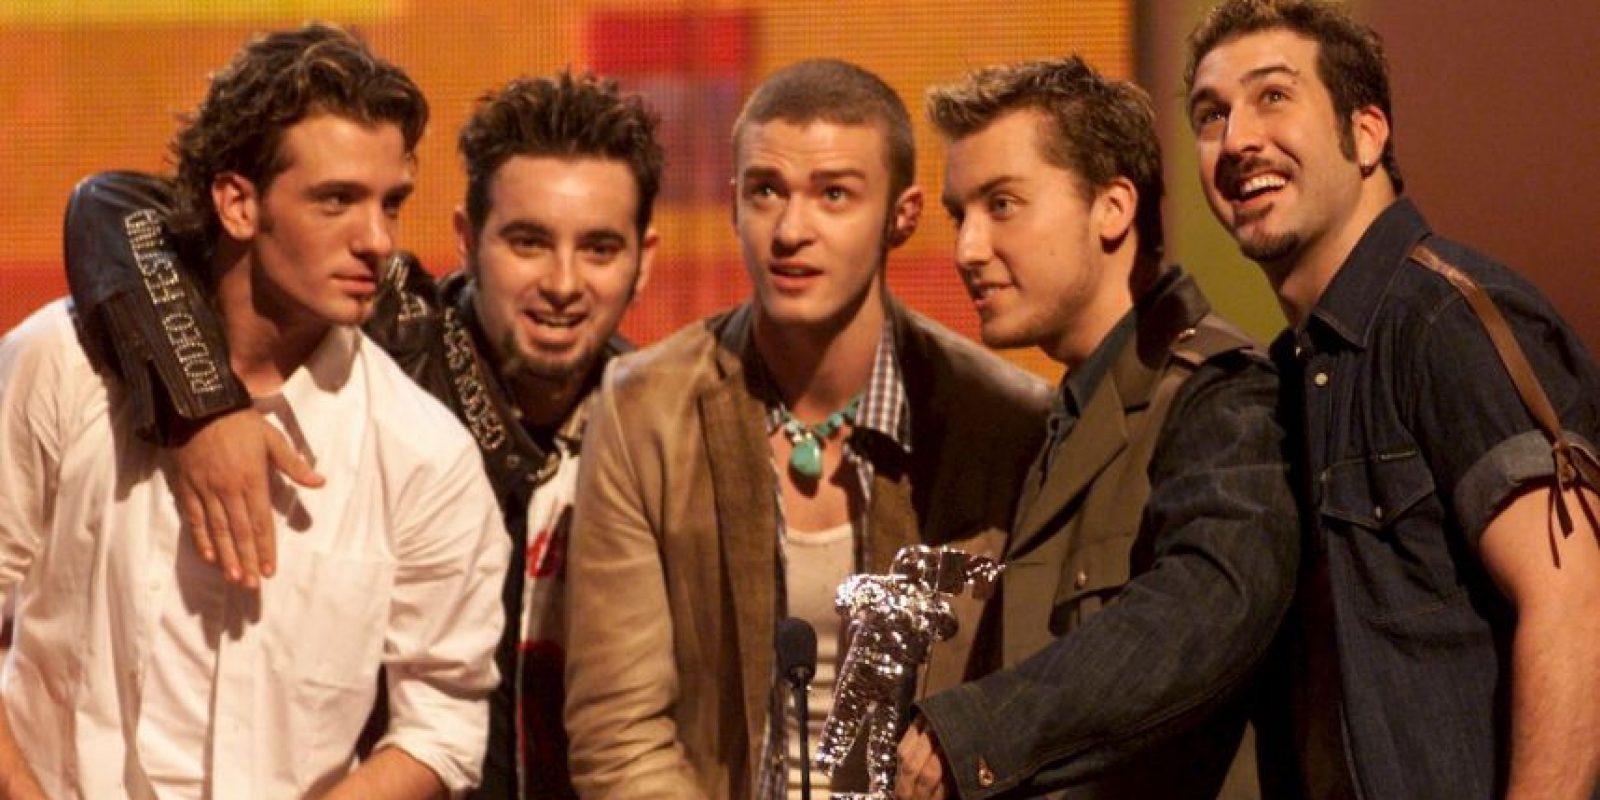 Justin Timberlake, Chris Kirkpatrick, Joey Fatone, Lance Bass y JC Chasez. Lynn Harless, madre de Justin, fue quien tuvo la idea del acrónimo. Foto:Getty Images